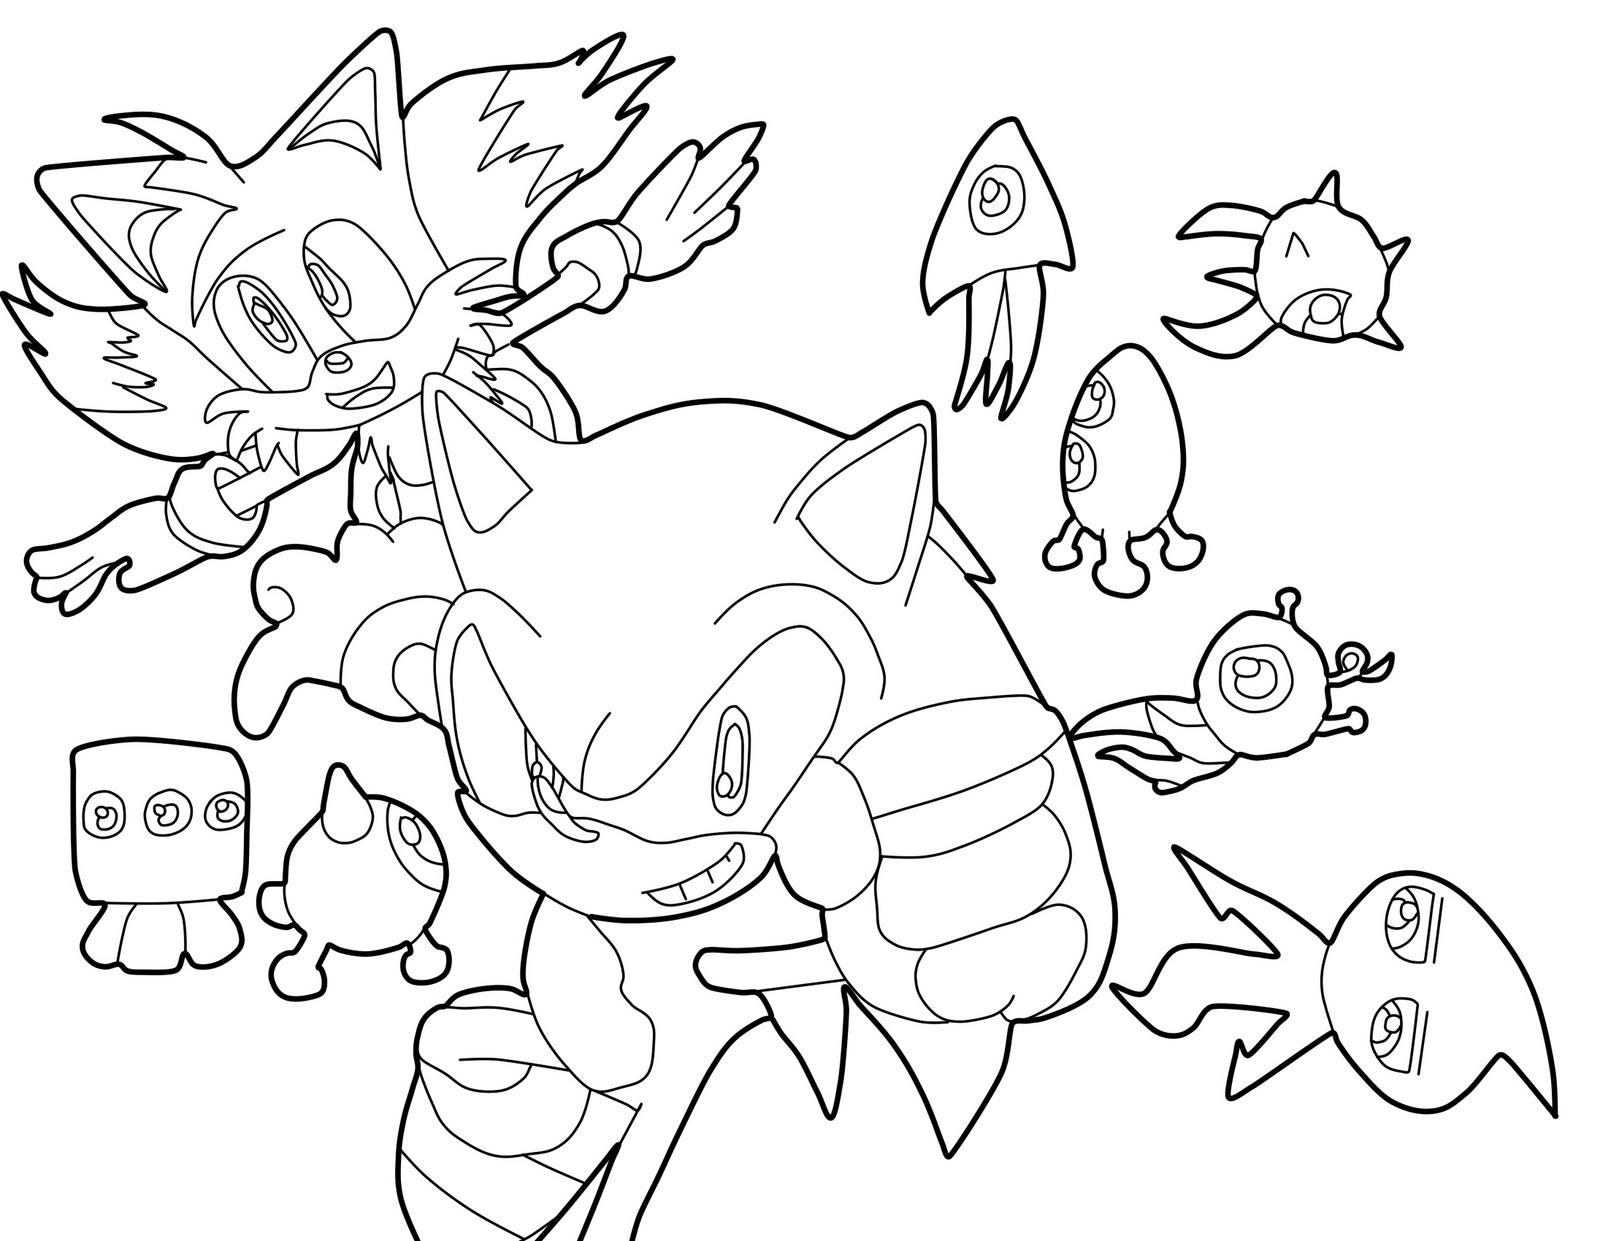 Imagenes De Sonic Para Imprimir: Blog MegaDiverso: Sonic Para Imprimir Y Pintar